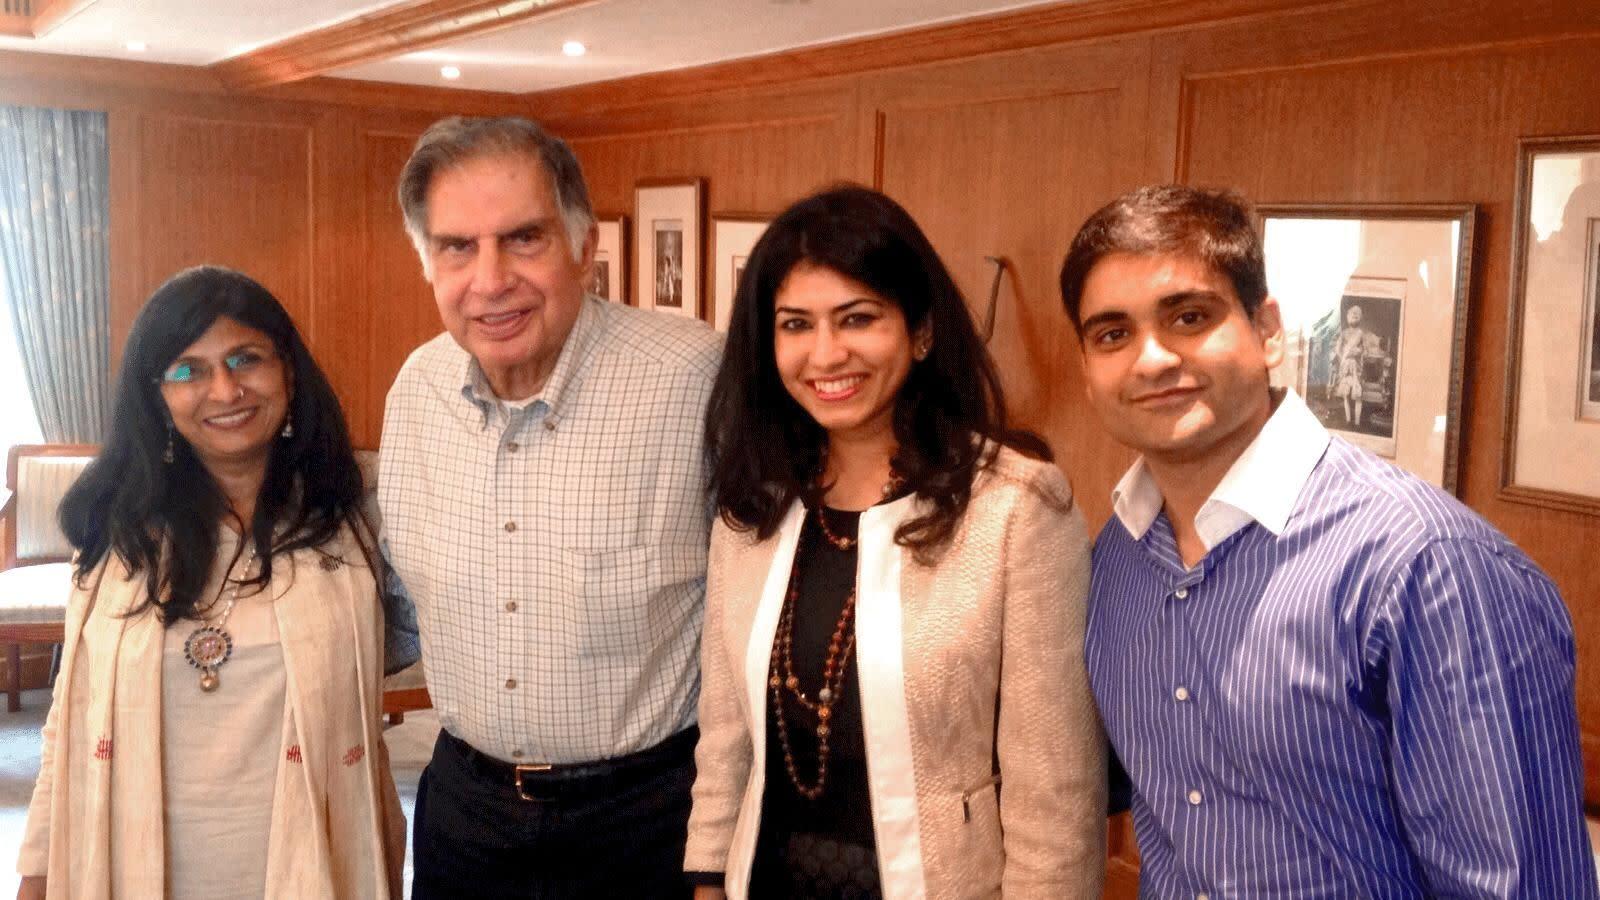 Ratan Tata Net Worth, Lifestyle, Biography, Wiki, Girlfriend, Family And More